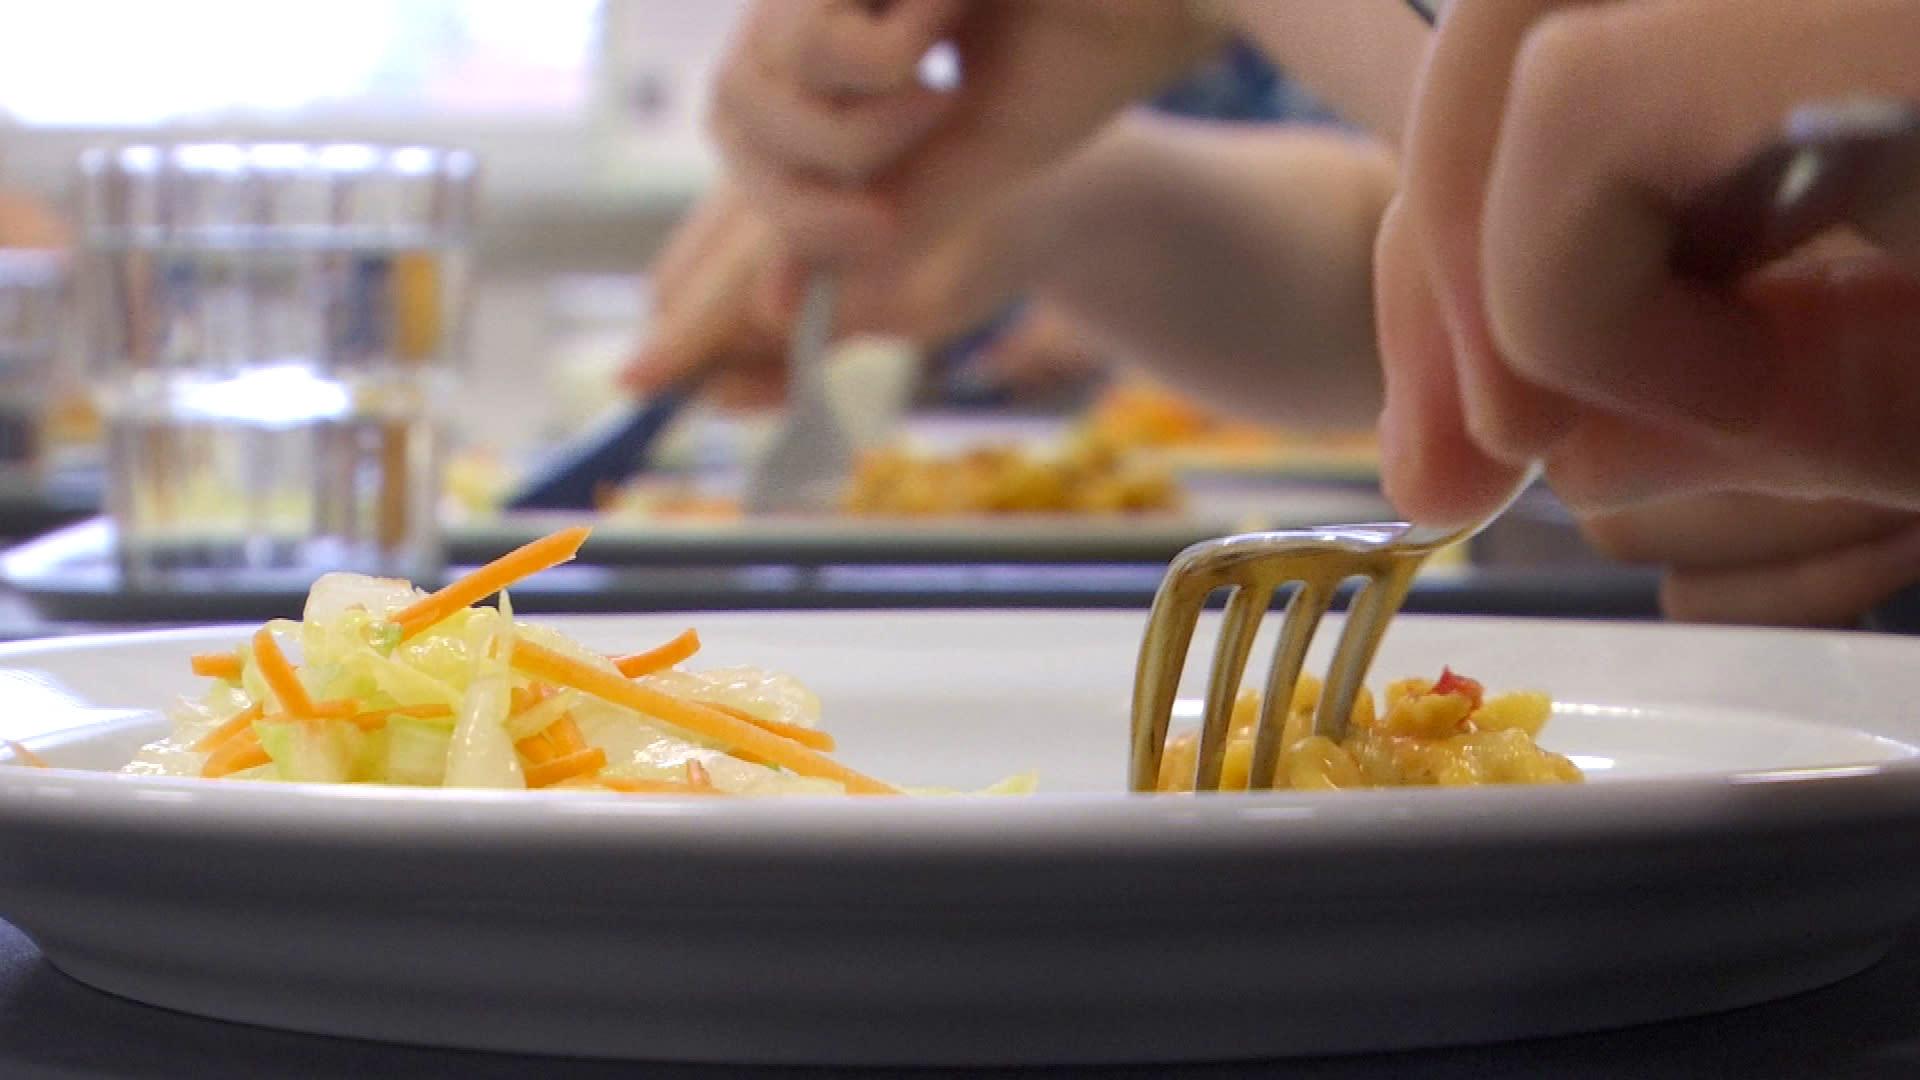 Pieni annos koululaisen lautasella.